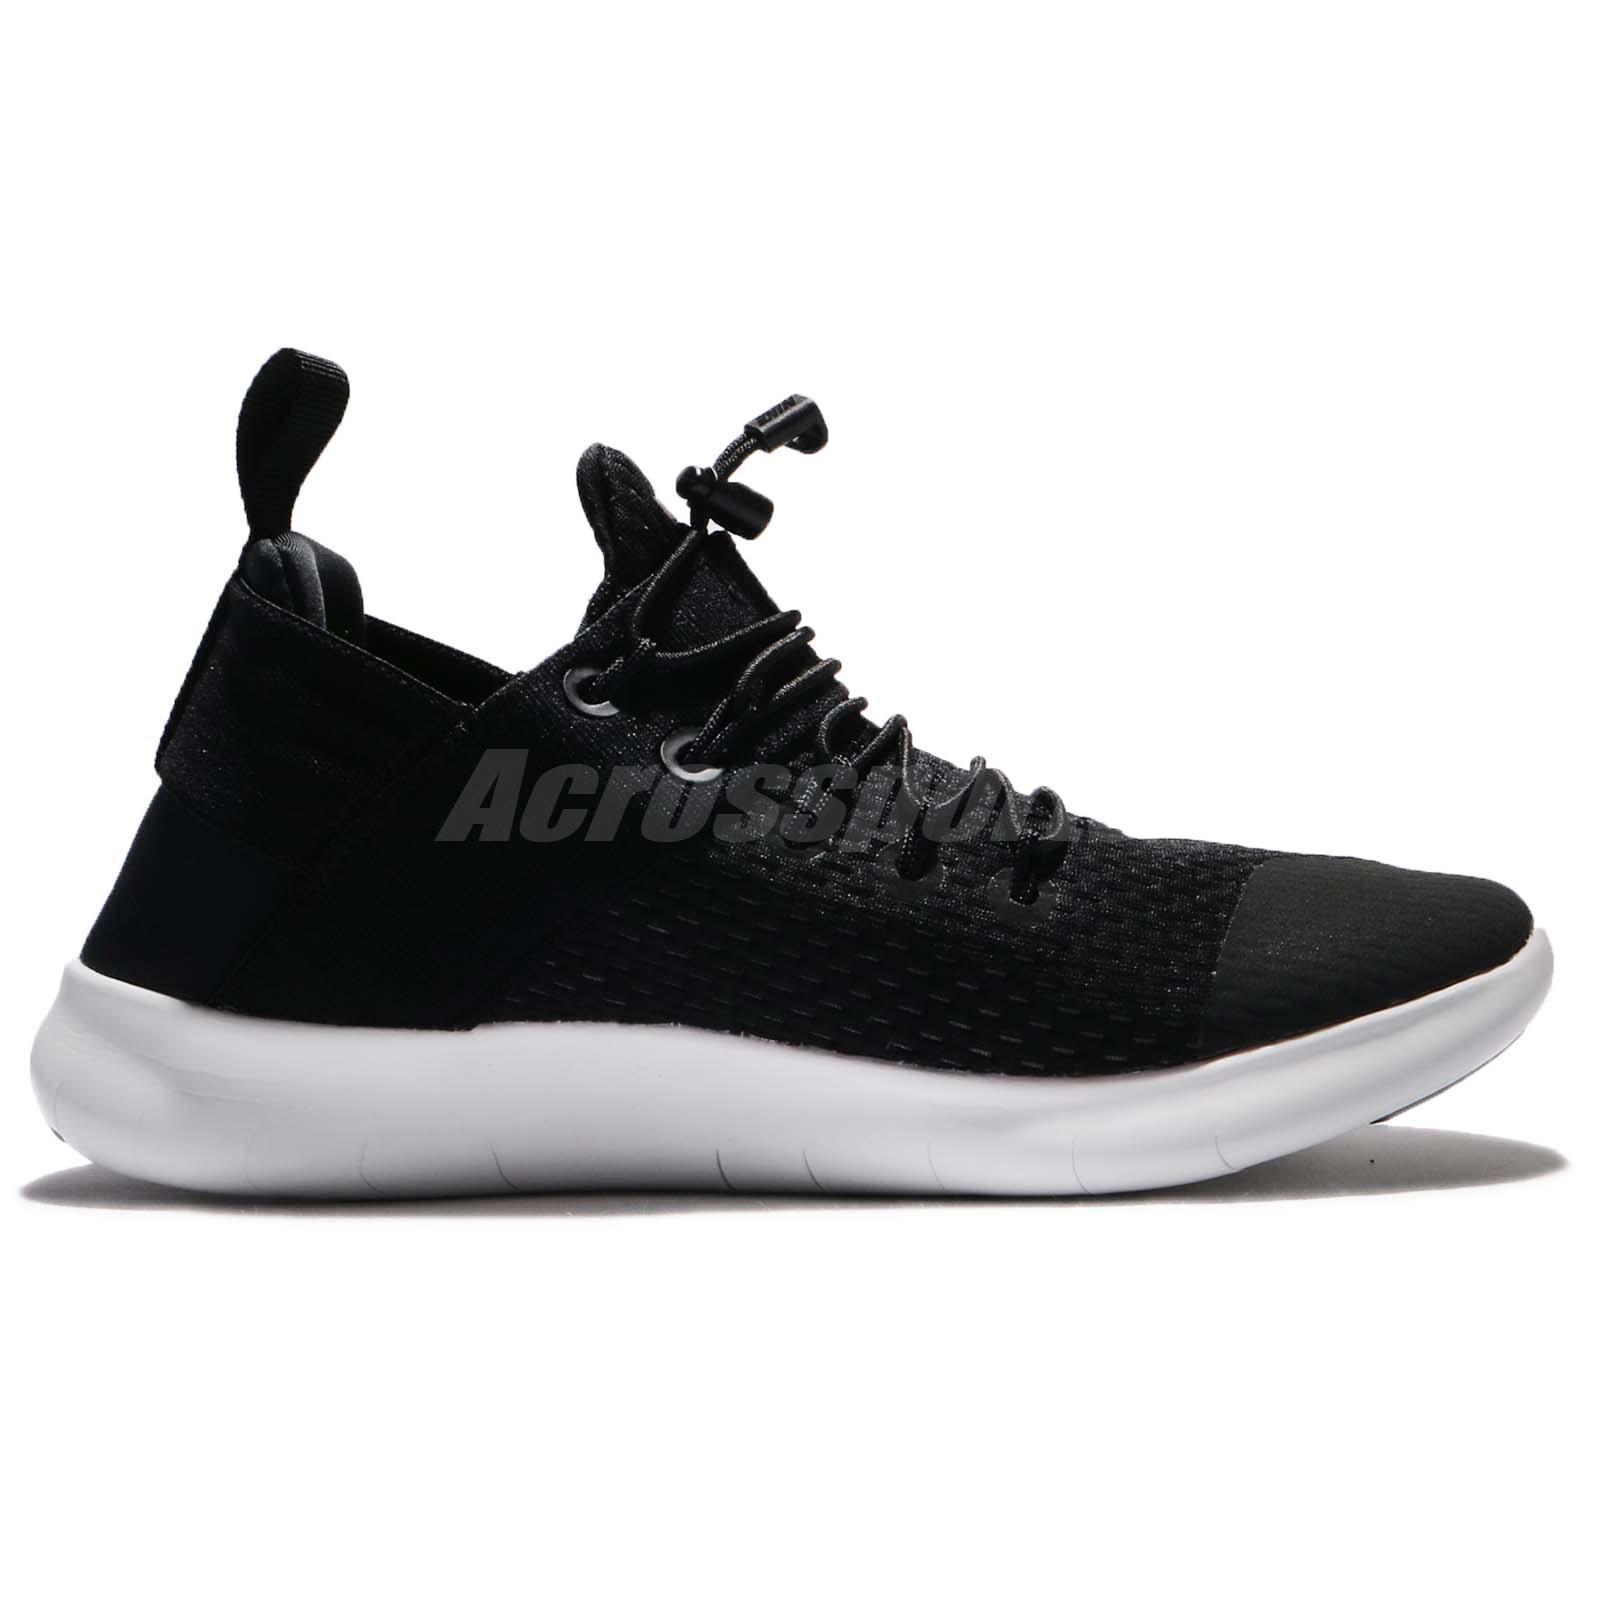 Nike Wmns Free RN CMTR 2017 Run Black